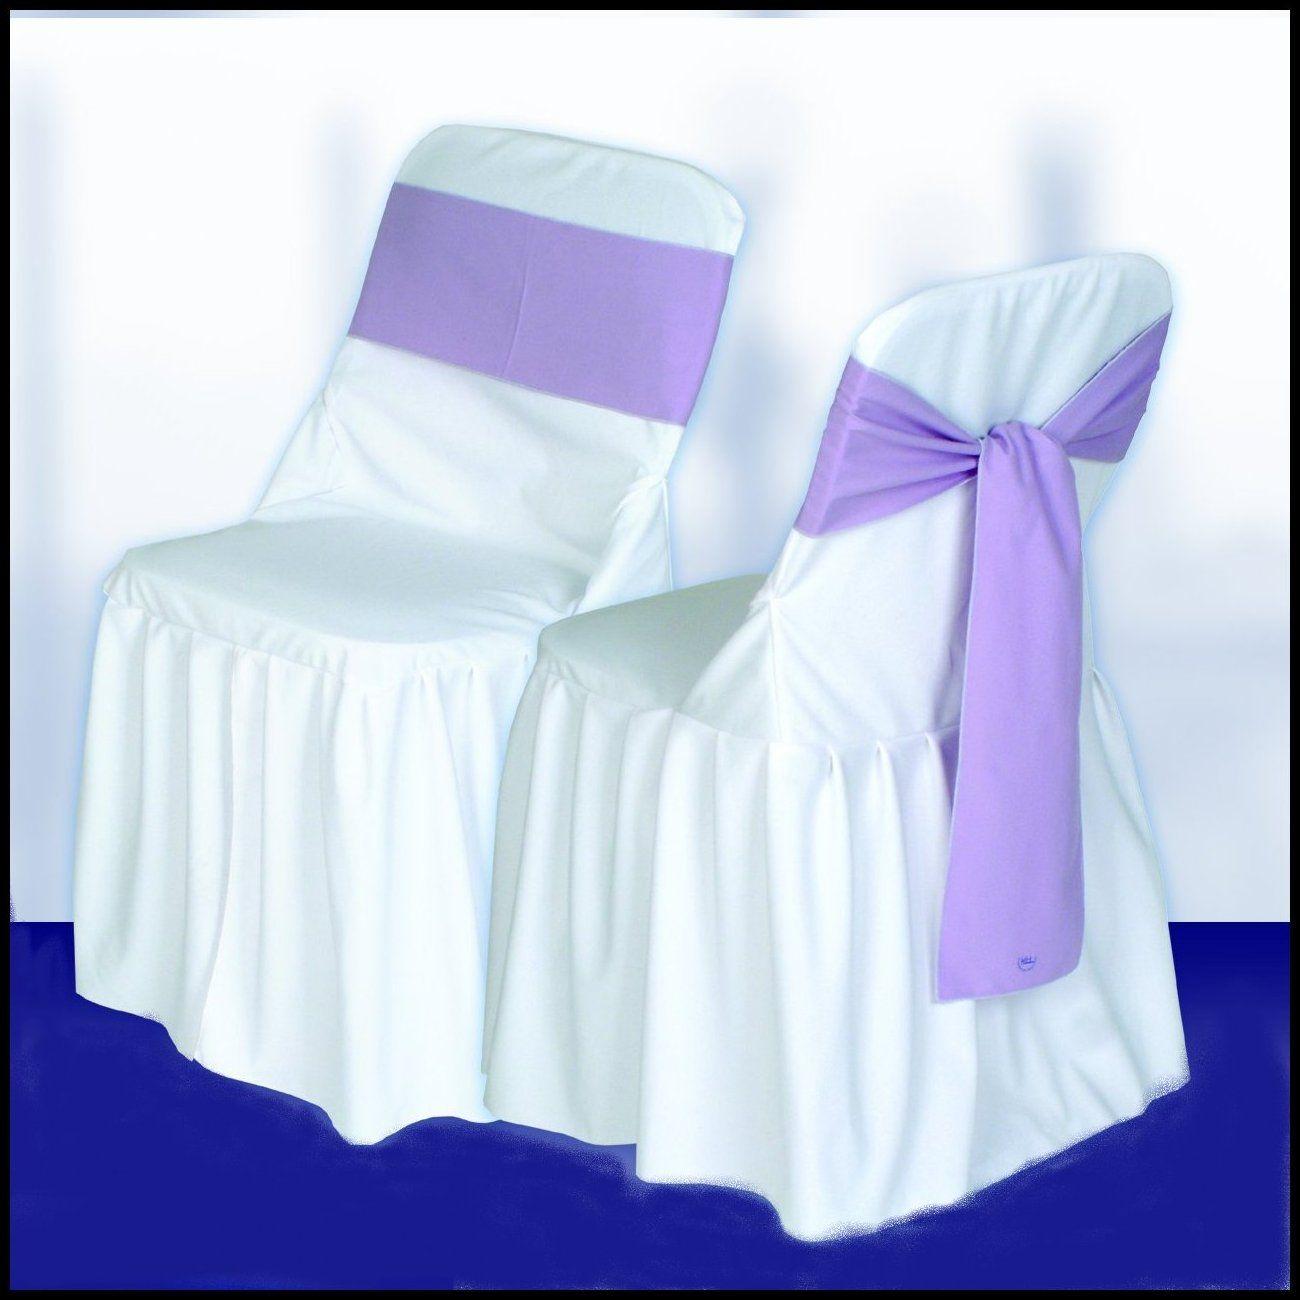 Cubre sillas para fiestas invitation samples blog for Sillas para eventos